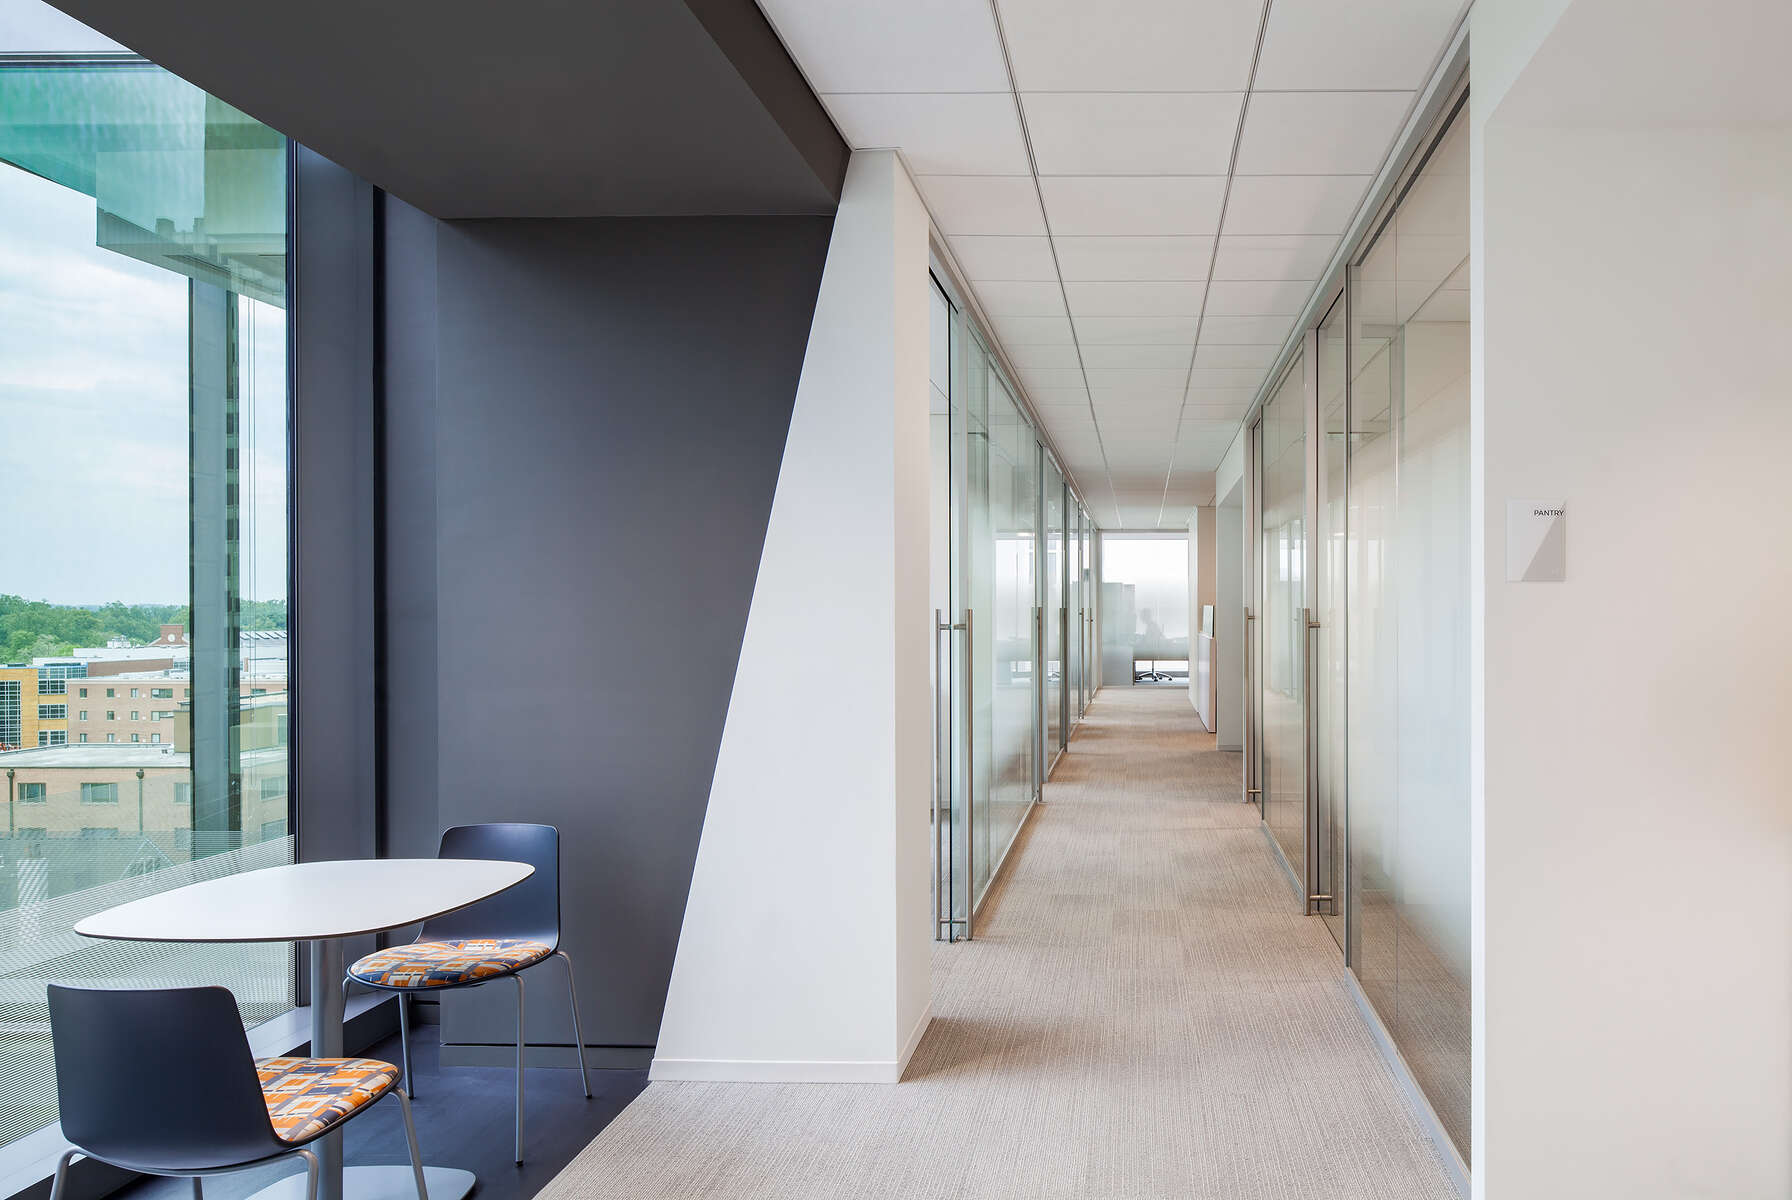 ASHPFOX Architects